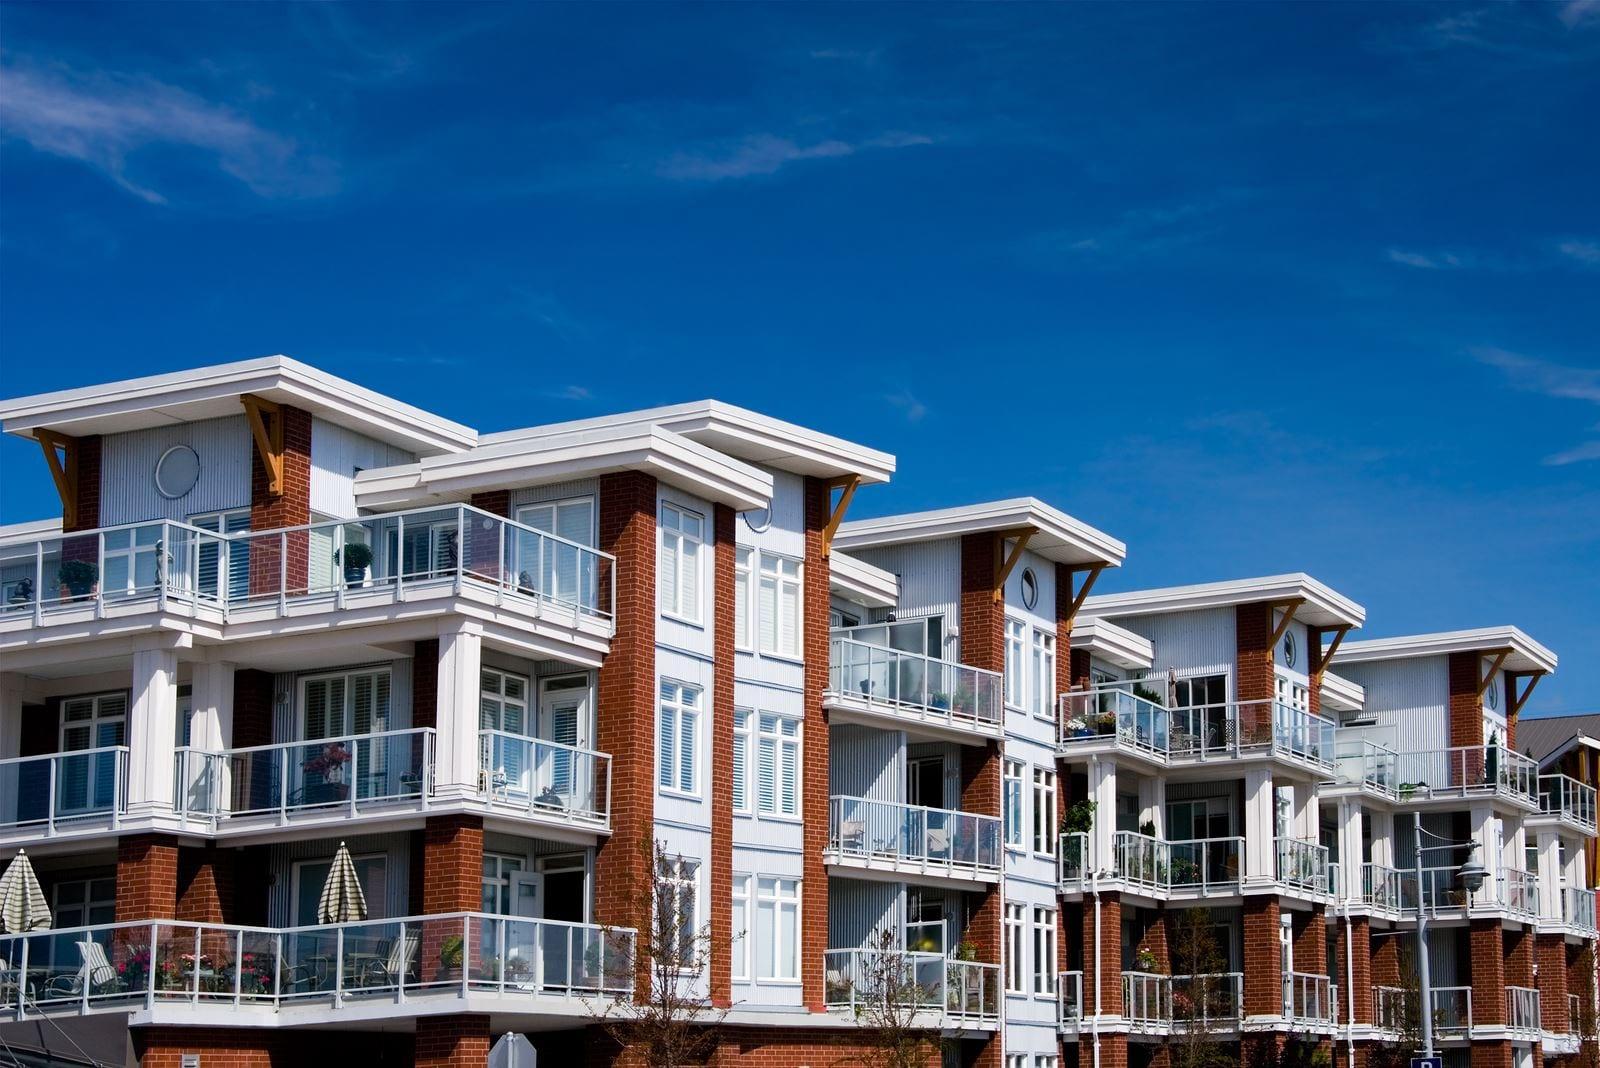 How to Buy a Multifamily Property With No Money | Mashvisor